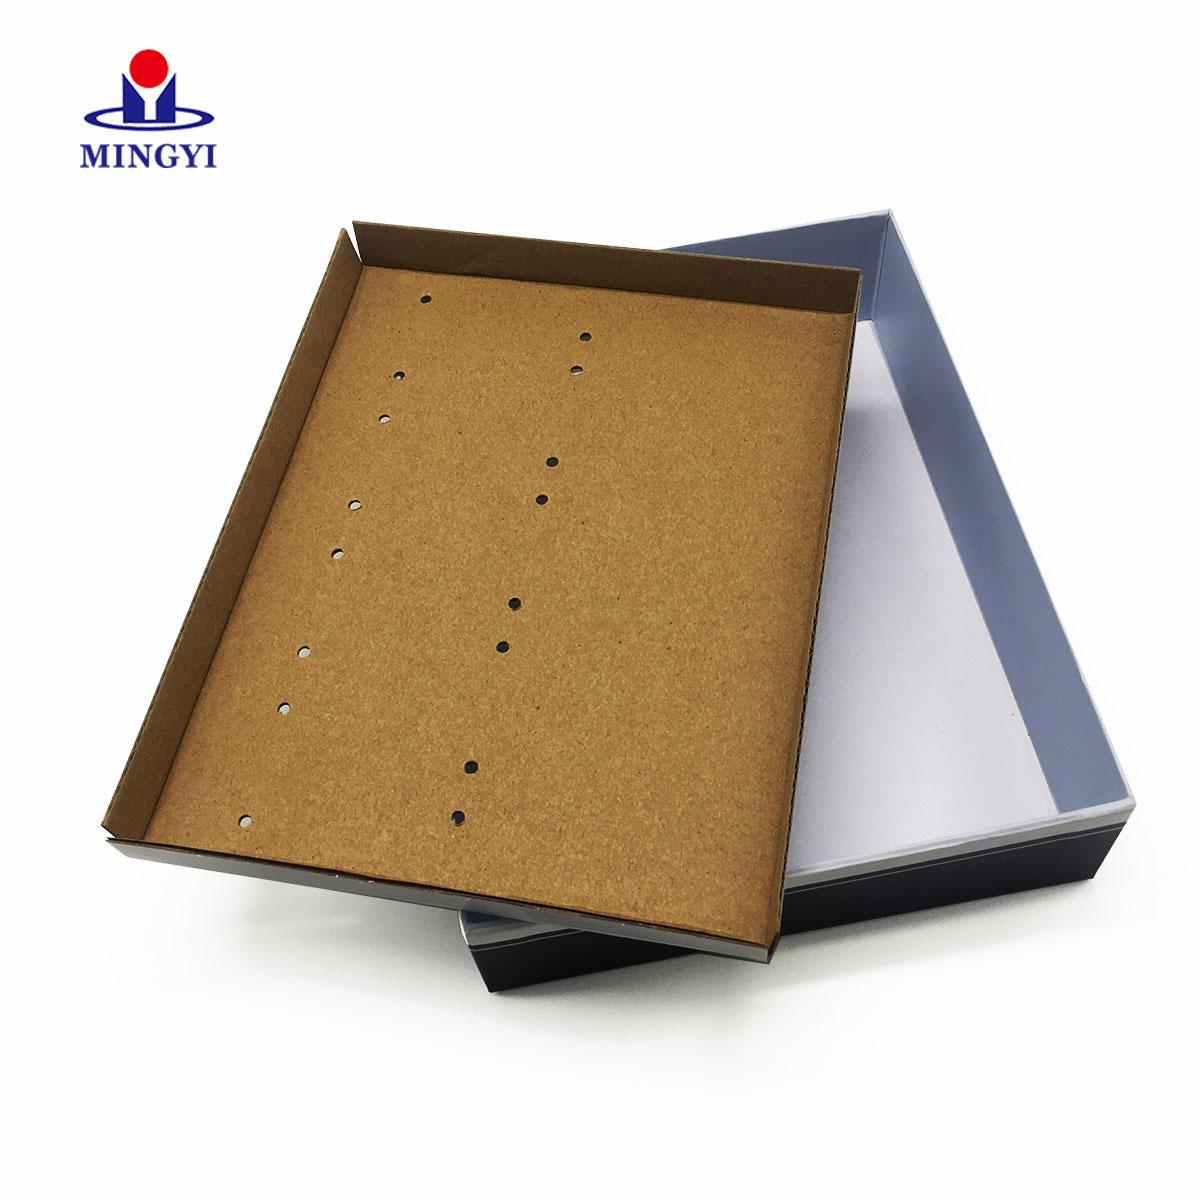 wooden Custom pvc watch gift box base Mingyi Printing-Mingyi Printing